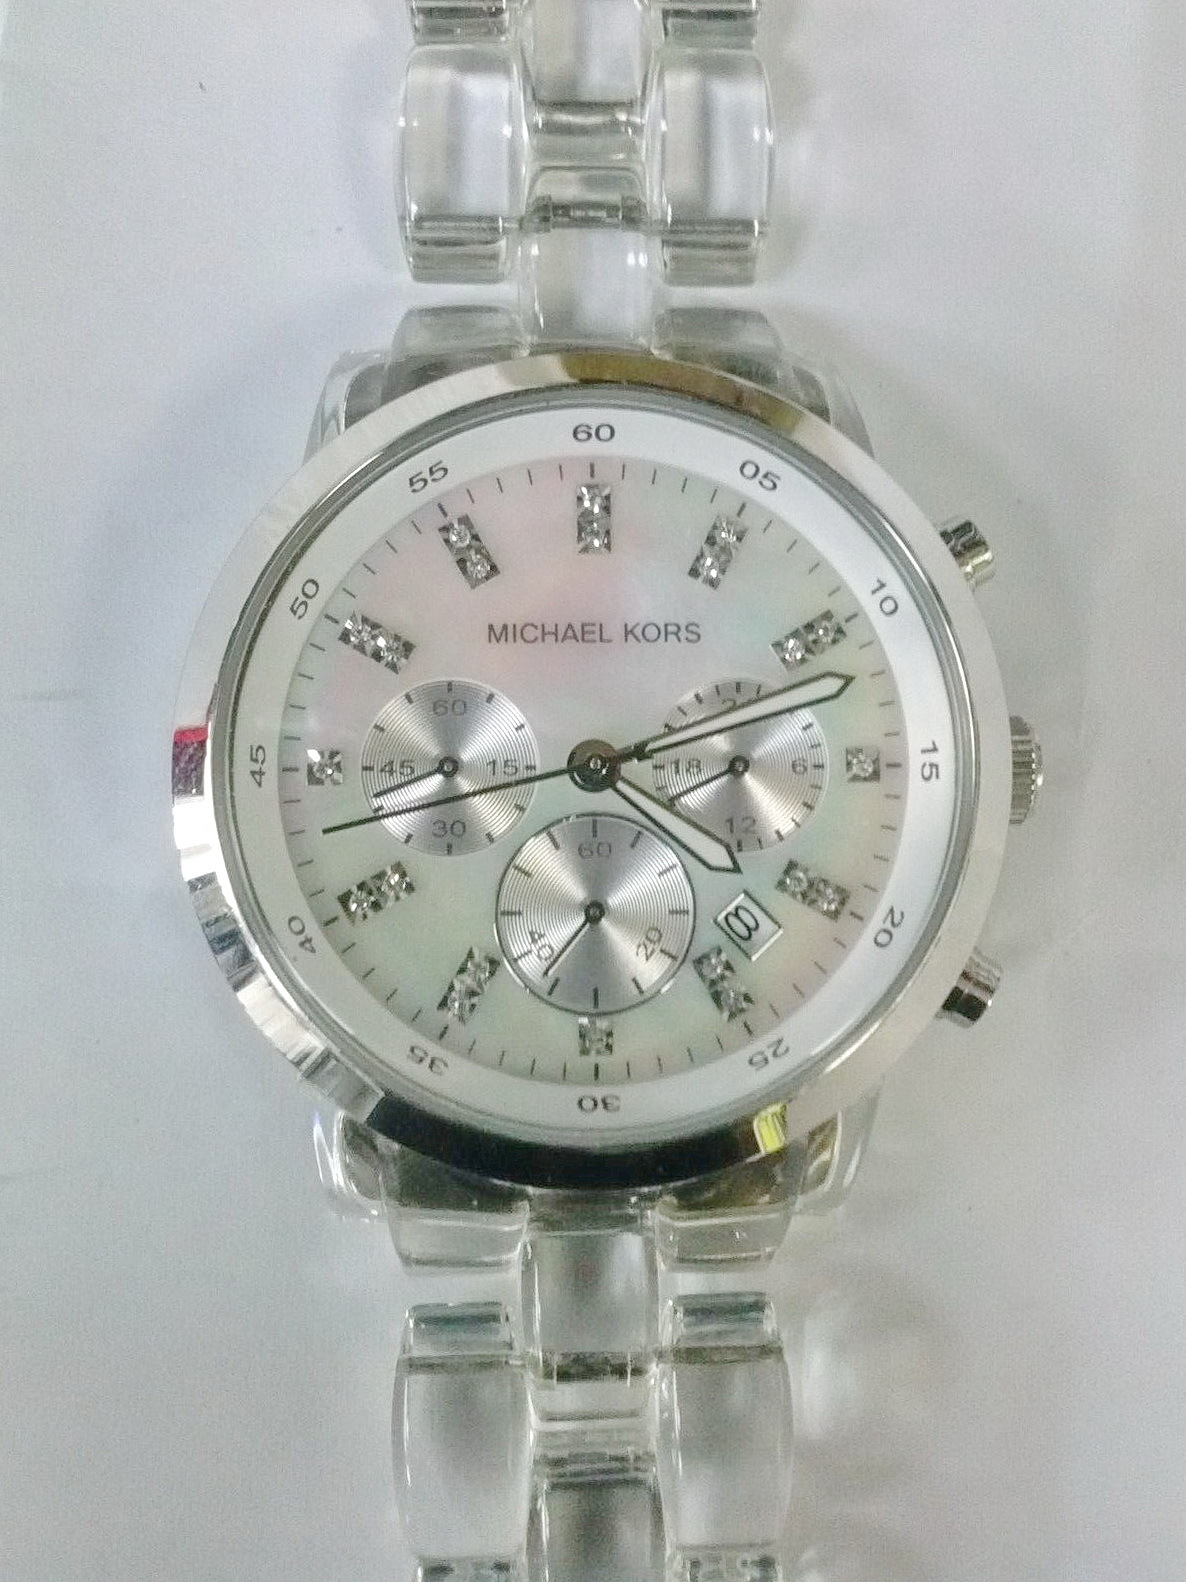 Michael Kors MK 5235 Mother Of Pearl Dial and 50 similar items